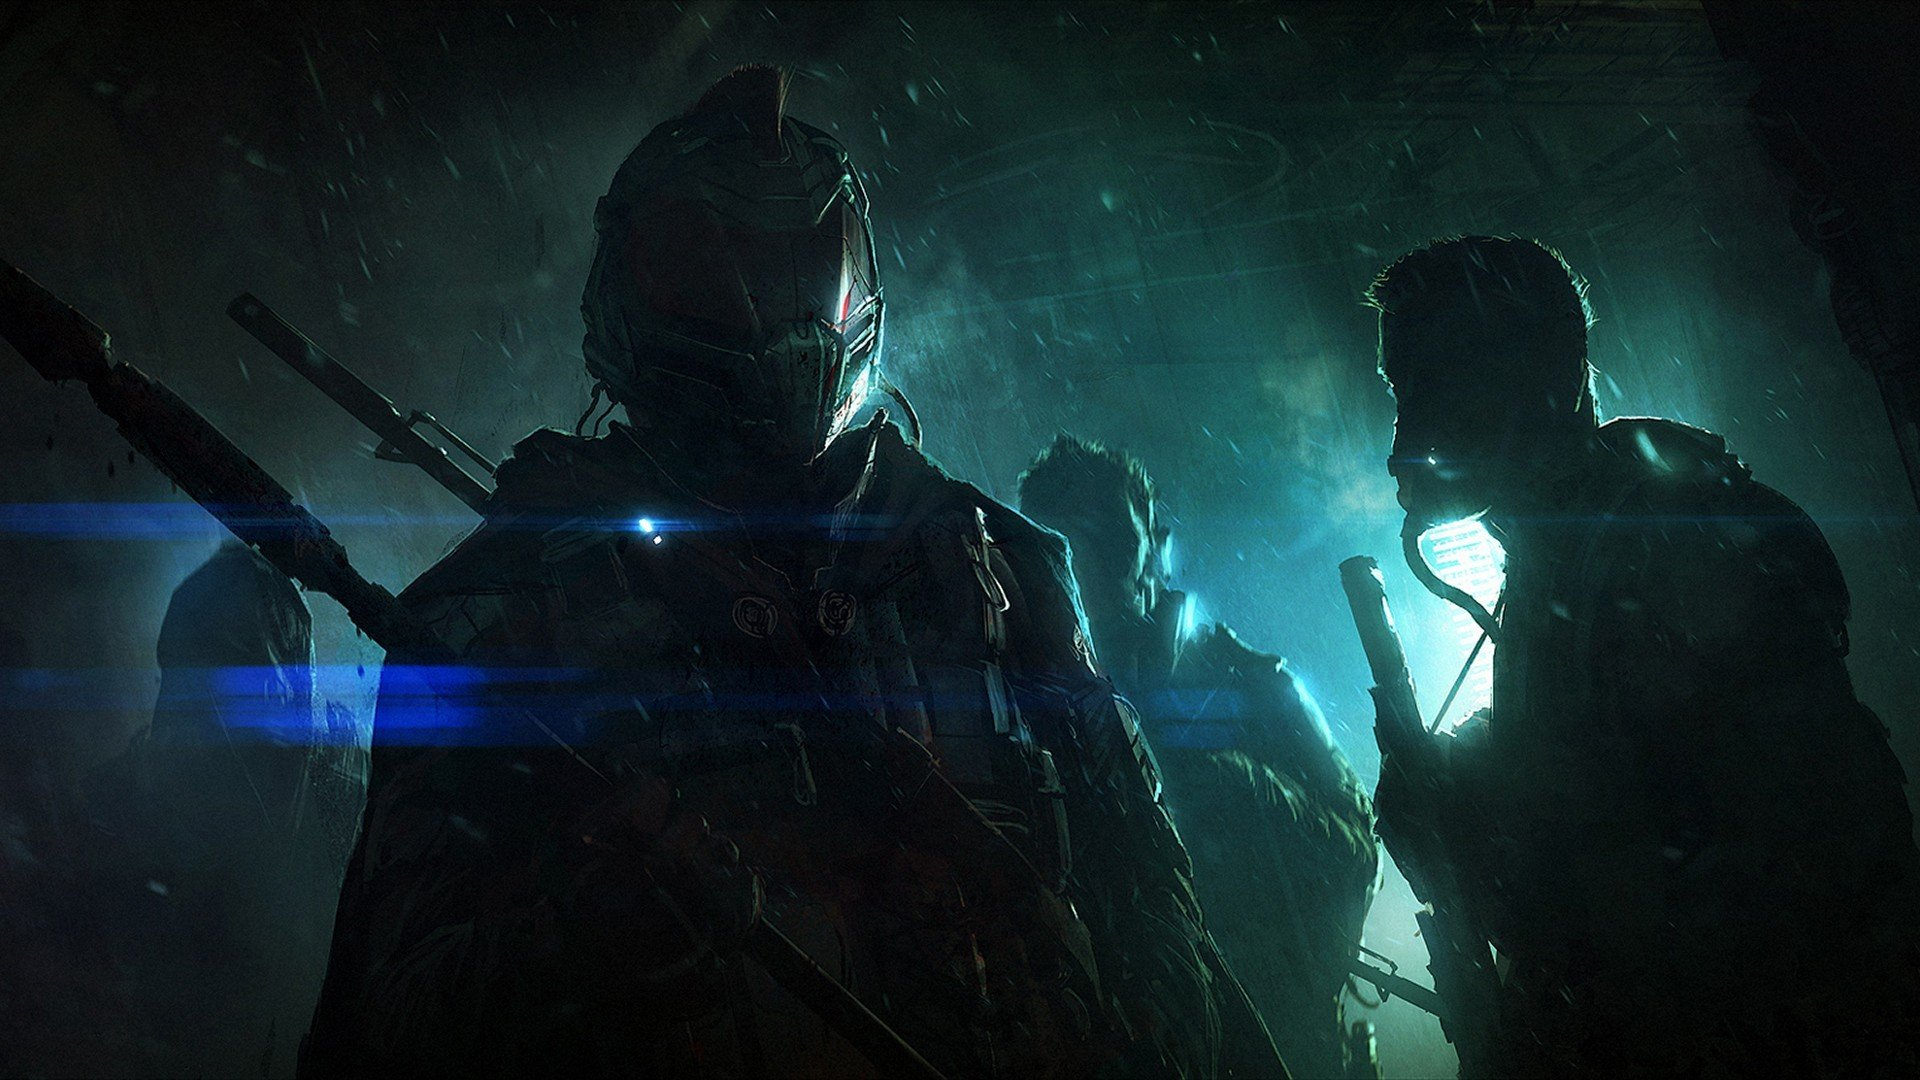 science-fiction-spaceships-artwork-futuristic-soldiers-digital-art-fantasy-art